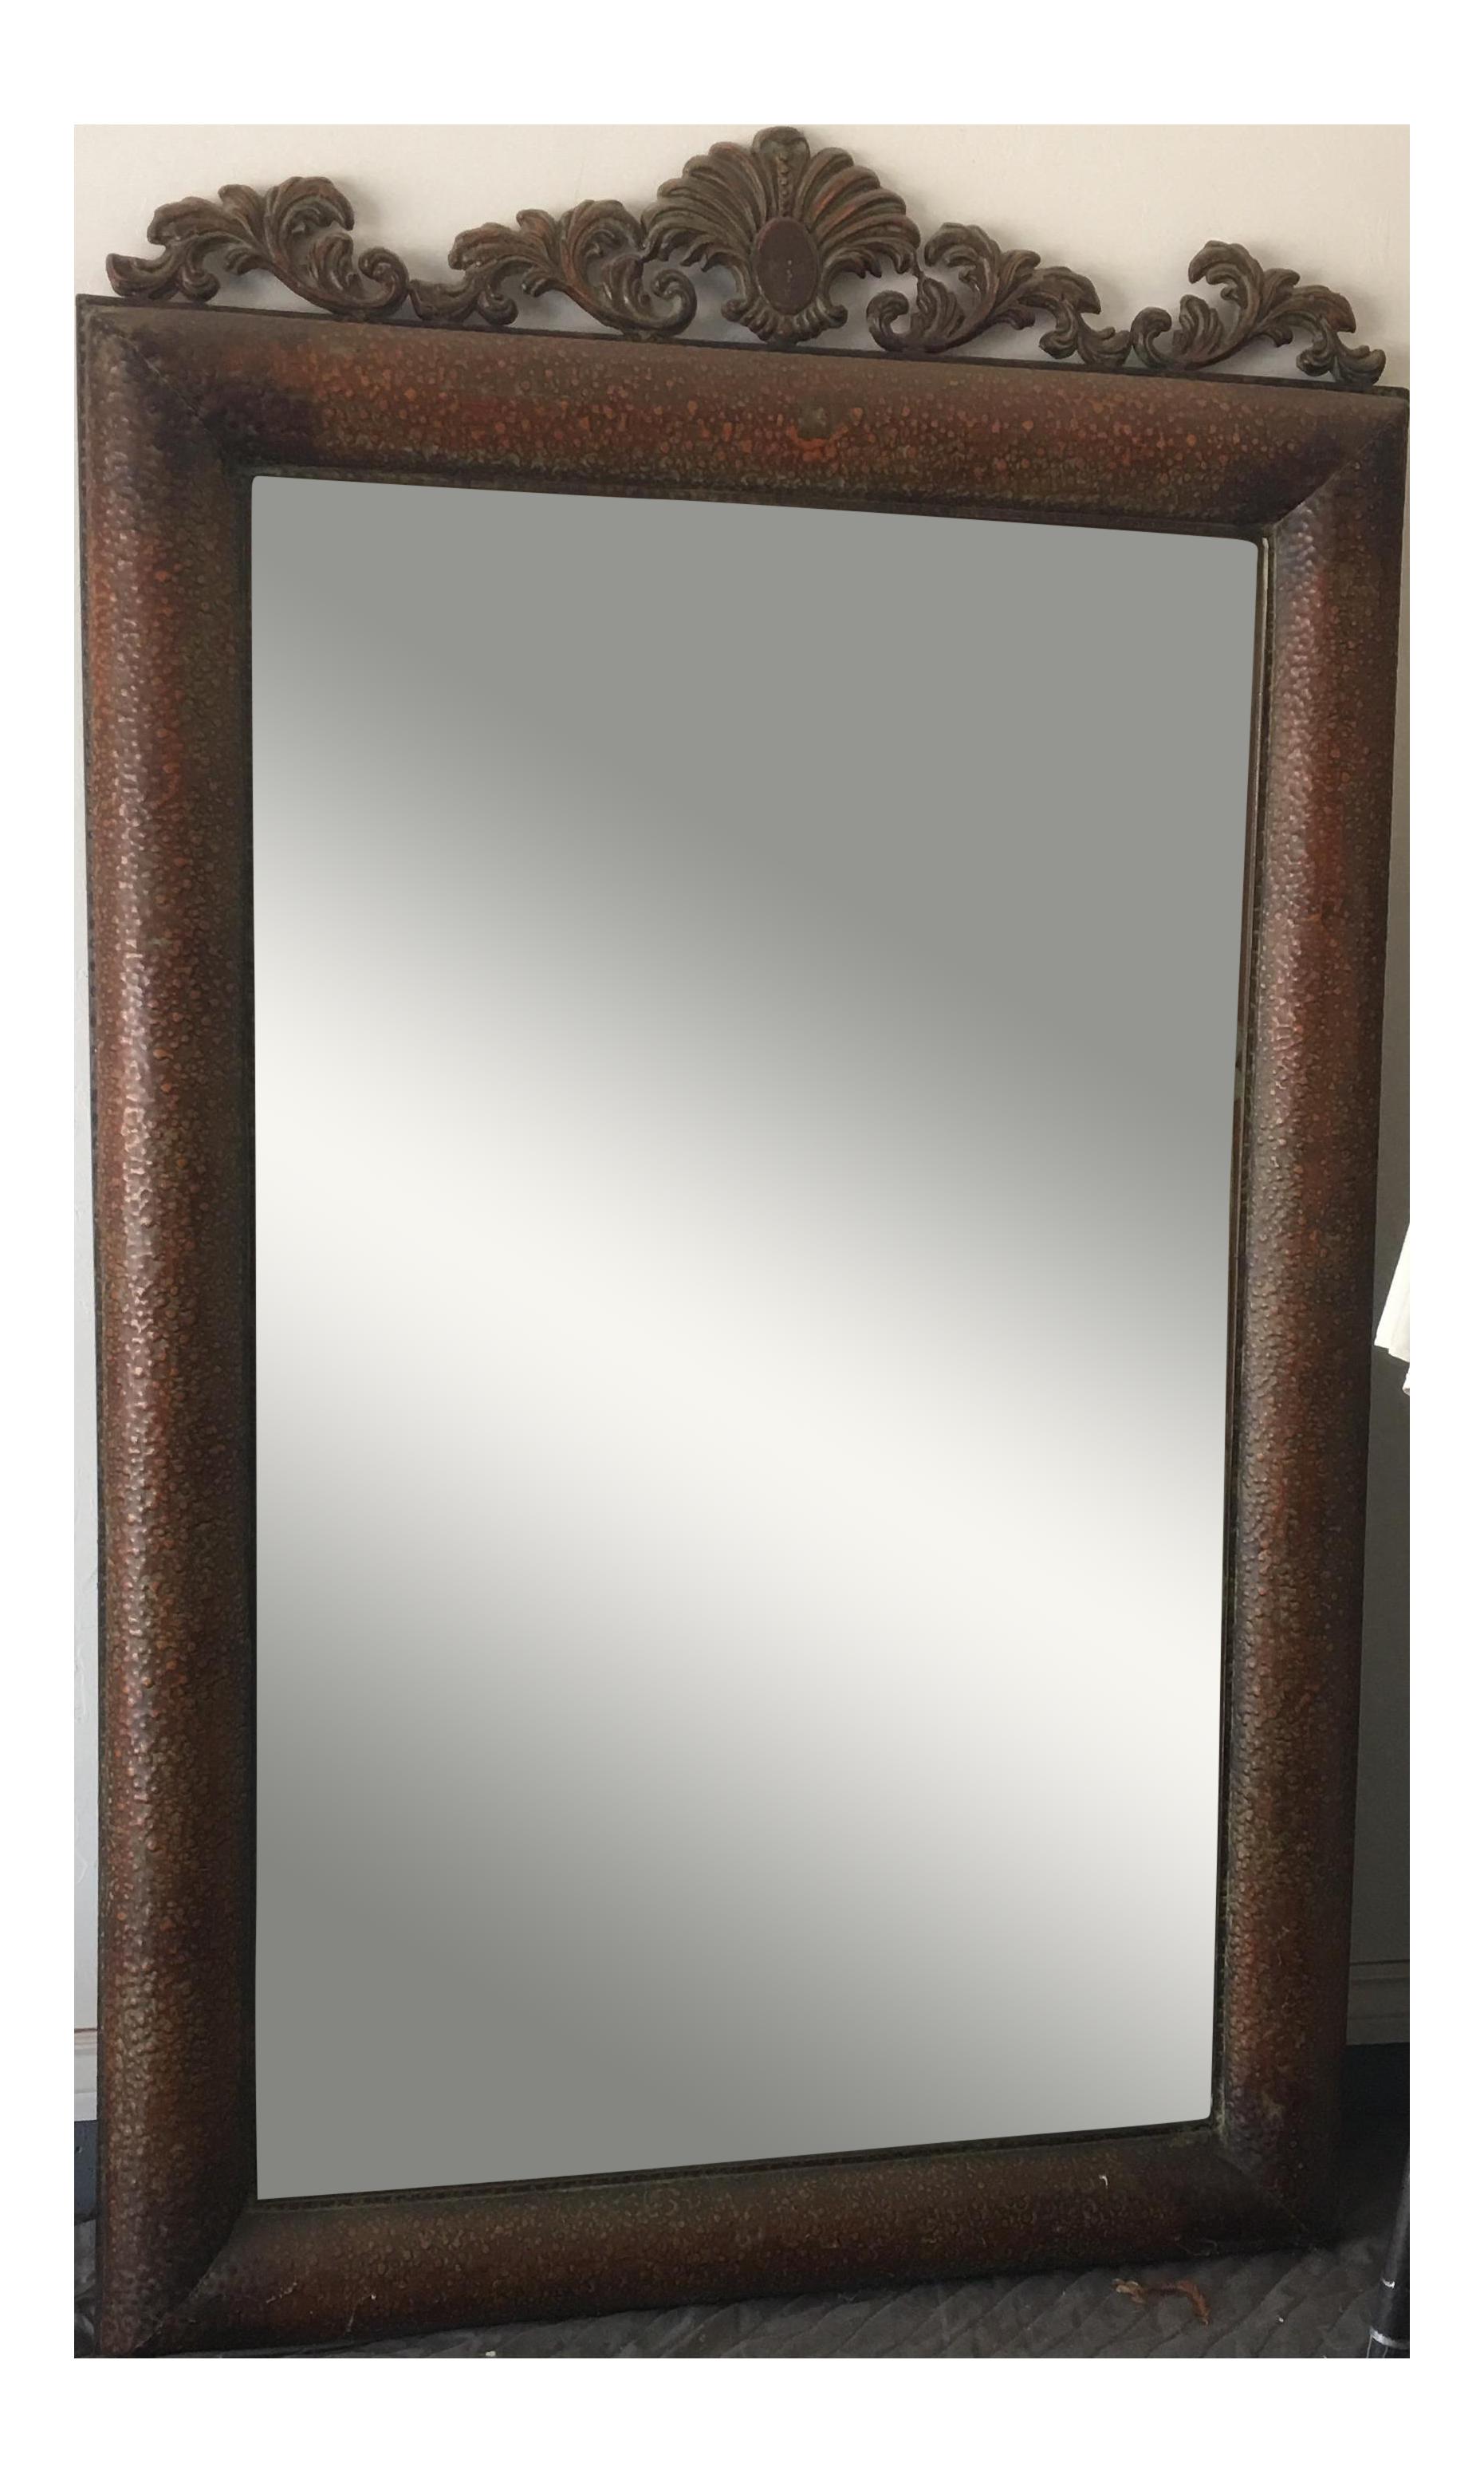 Copper Metal Wall Mirror Chairish